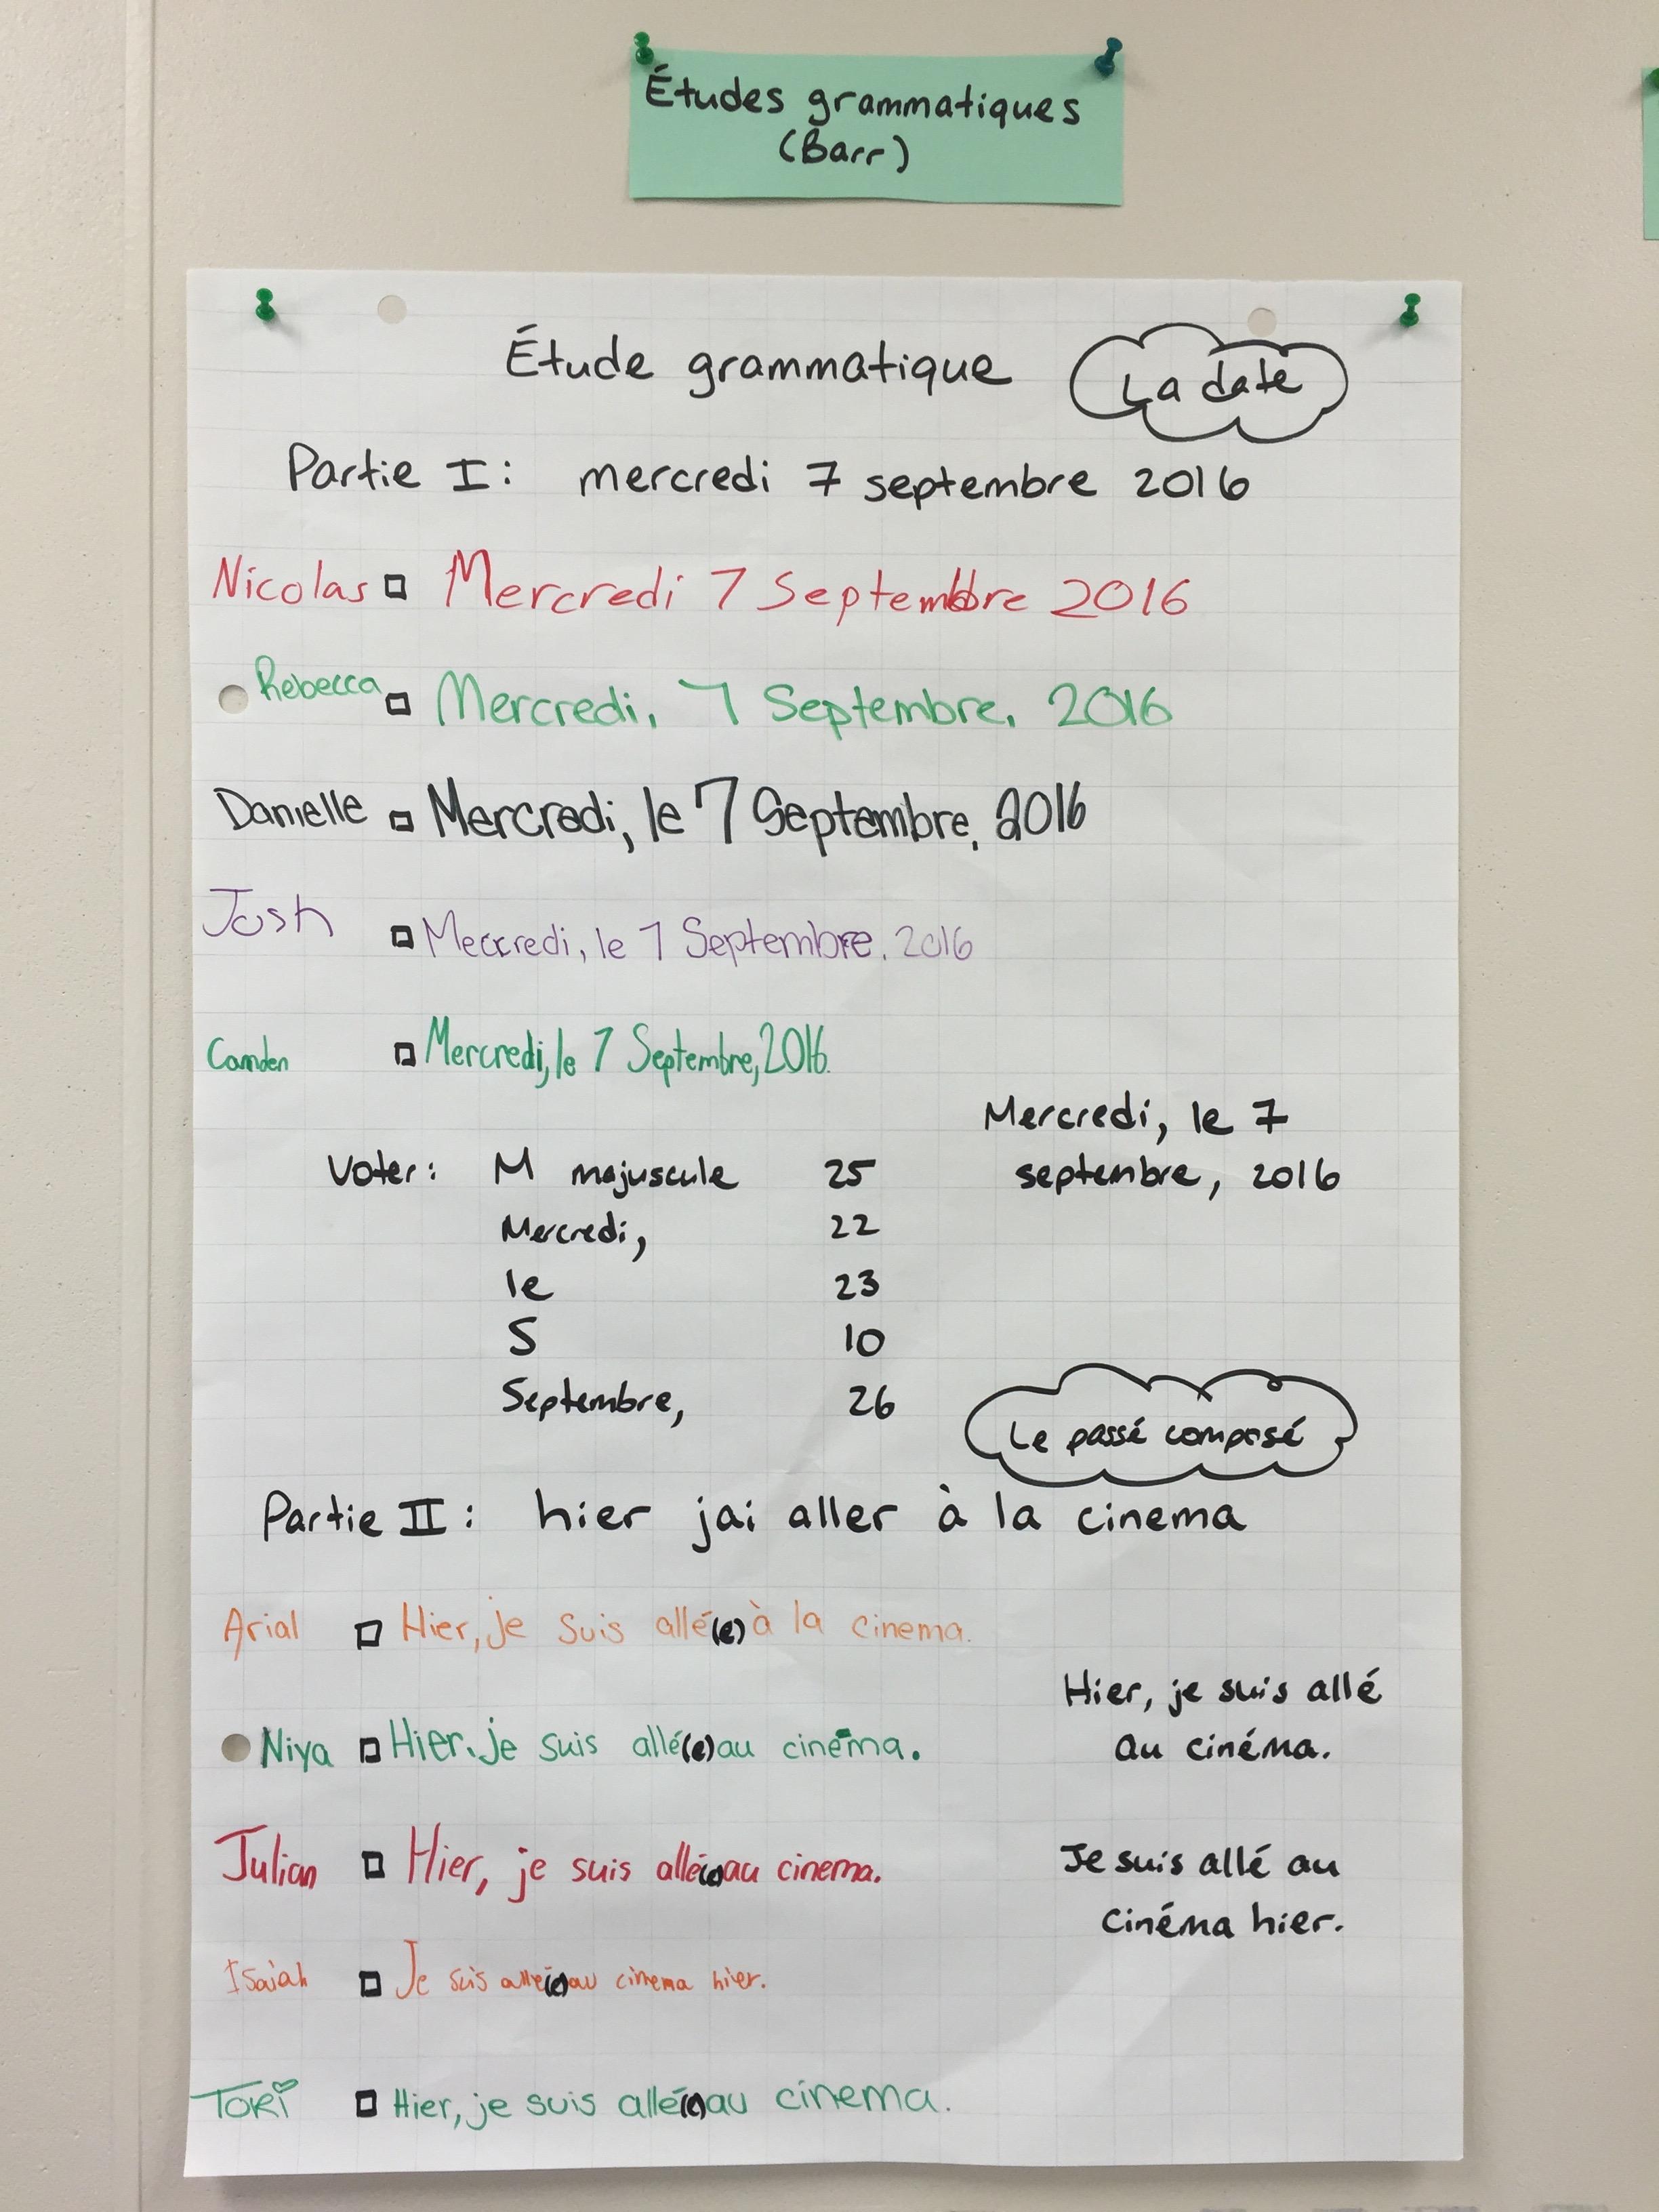 2016-09-07-barr-ecc81tude-grammatique.jpg